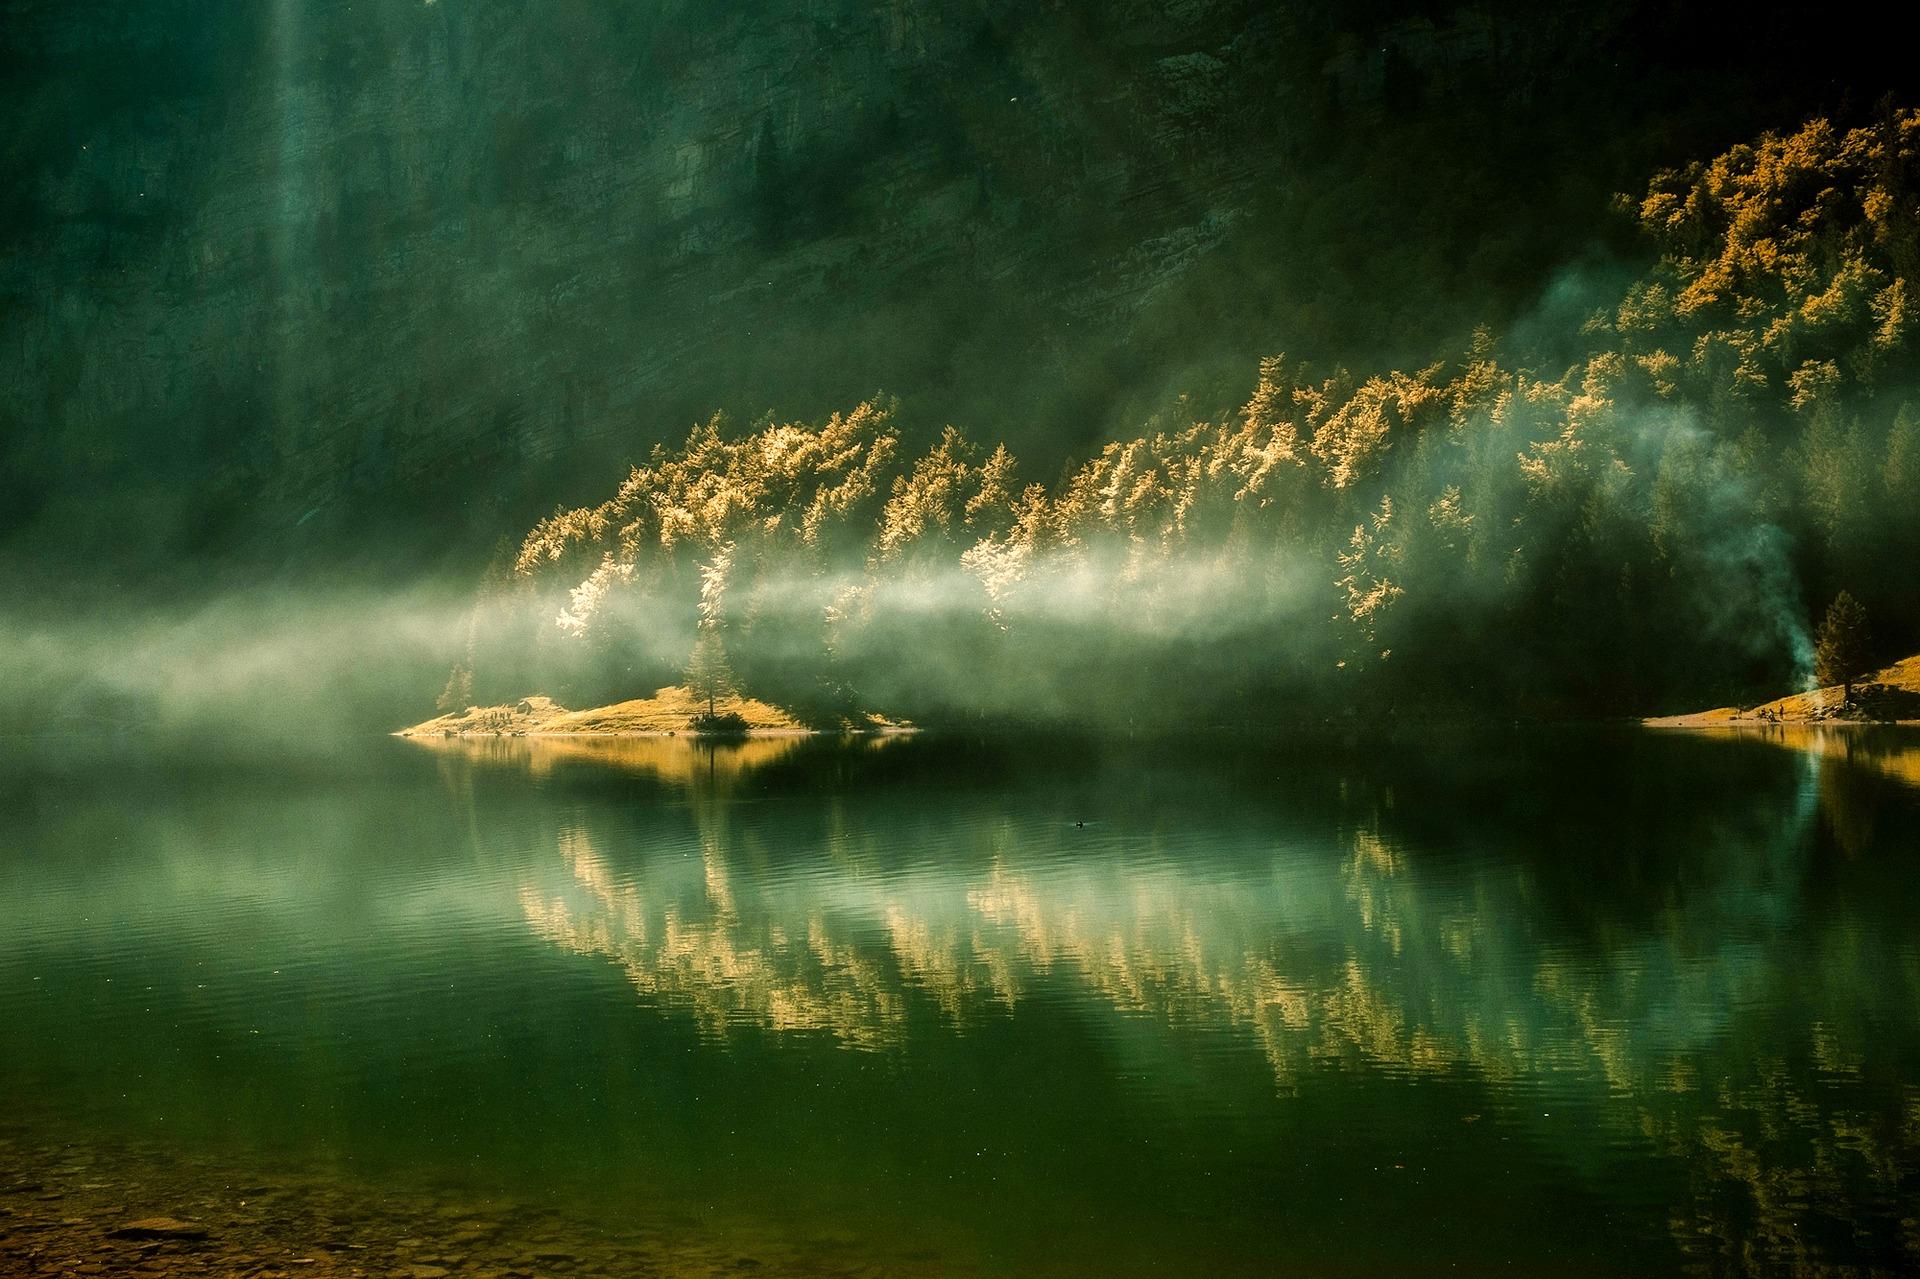 sunrise reflection-2380281_1920.jpg